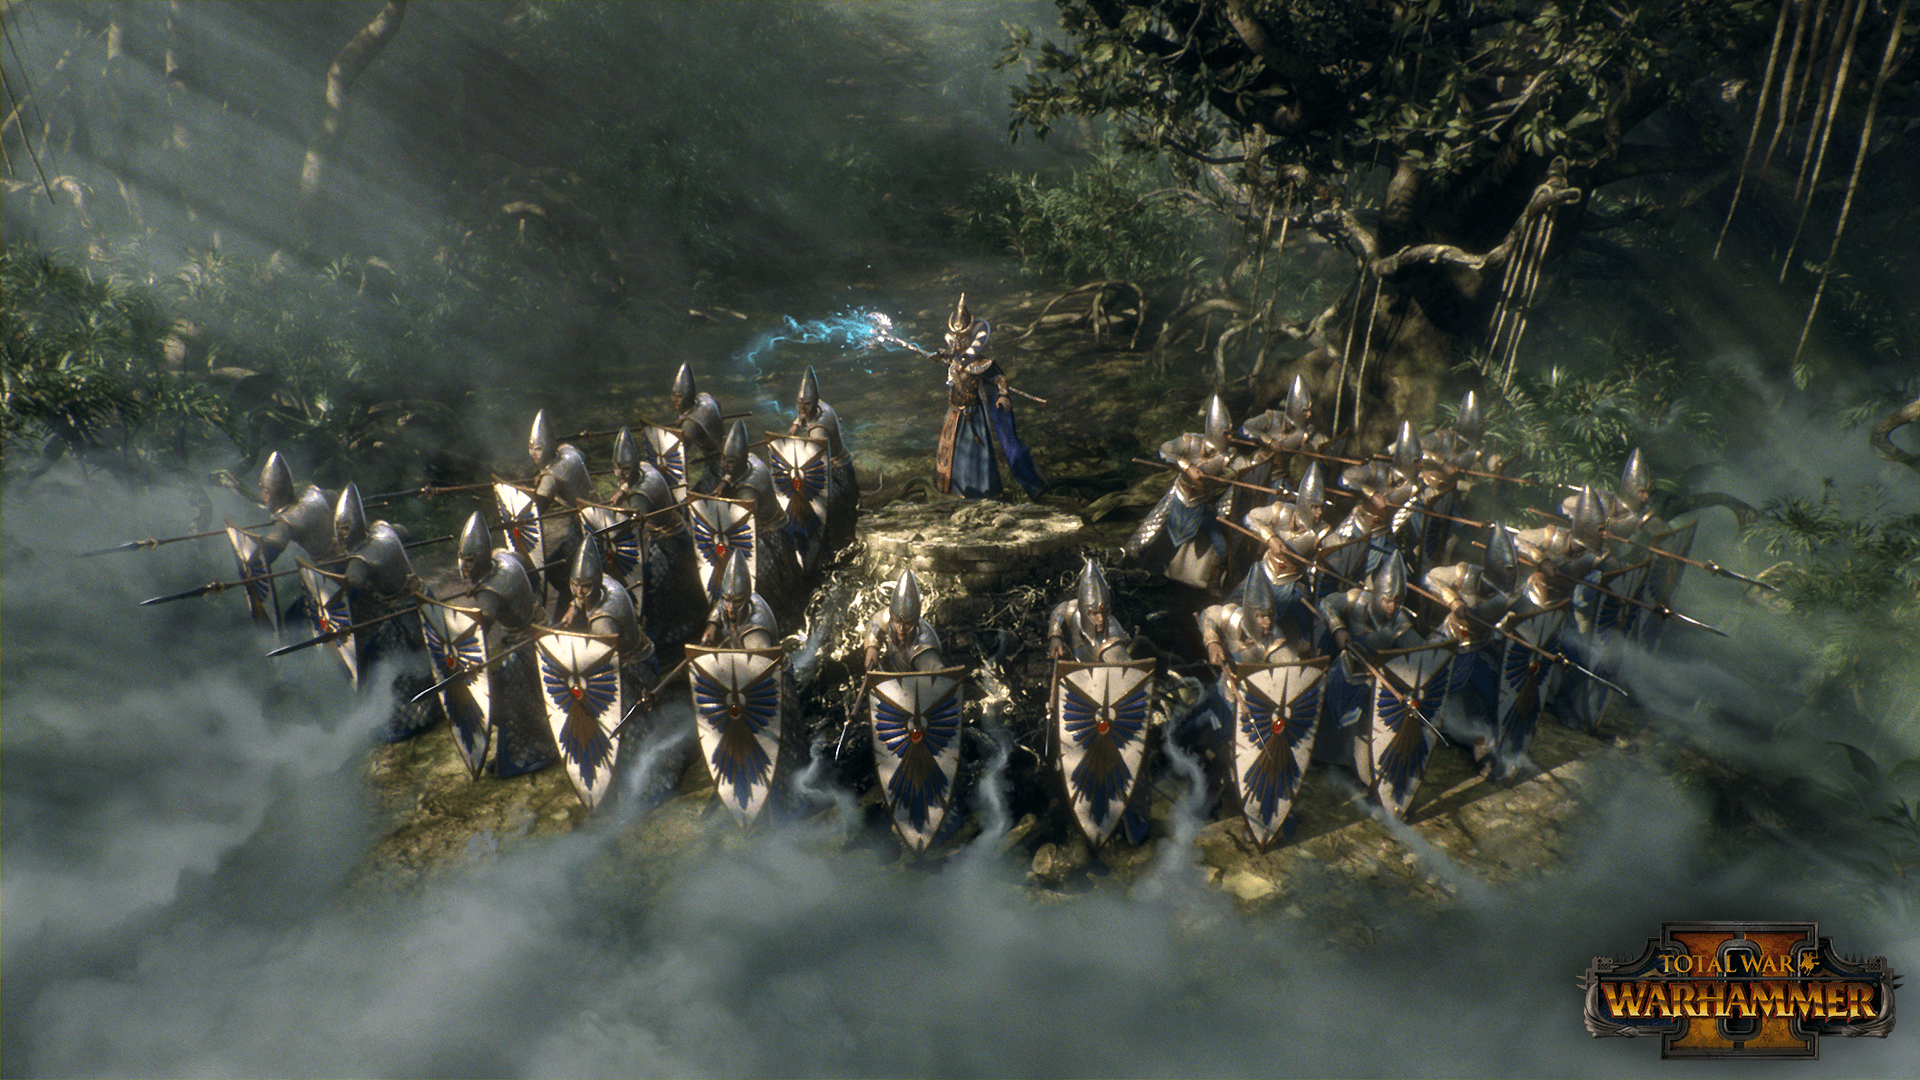 Total War Warhammer Ii Wallpapers Wallpaper Cave